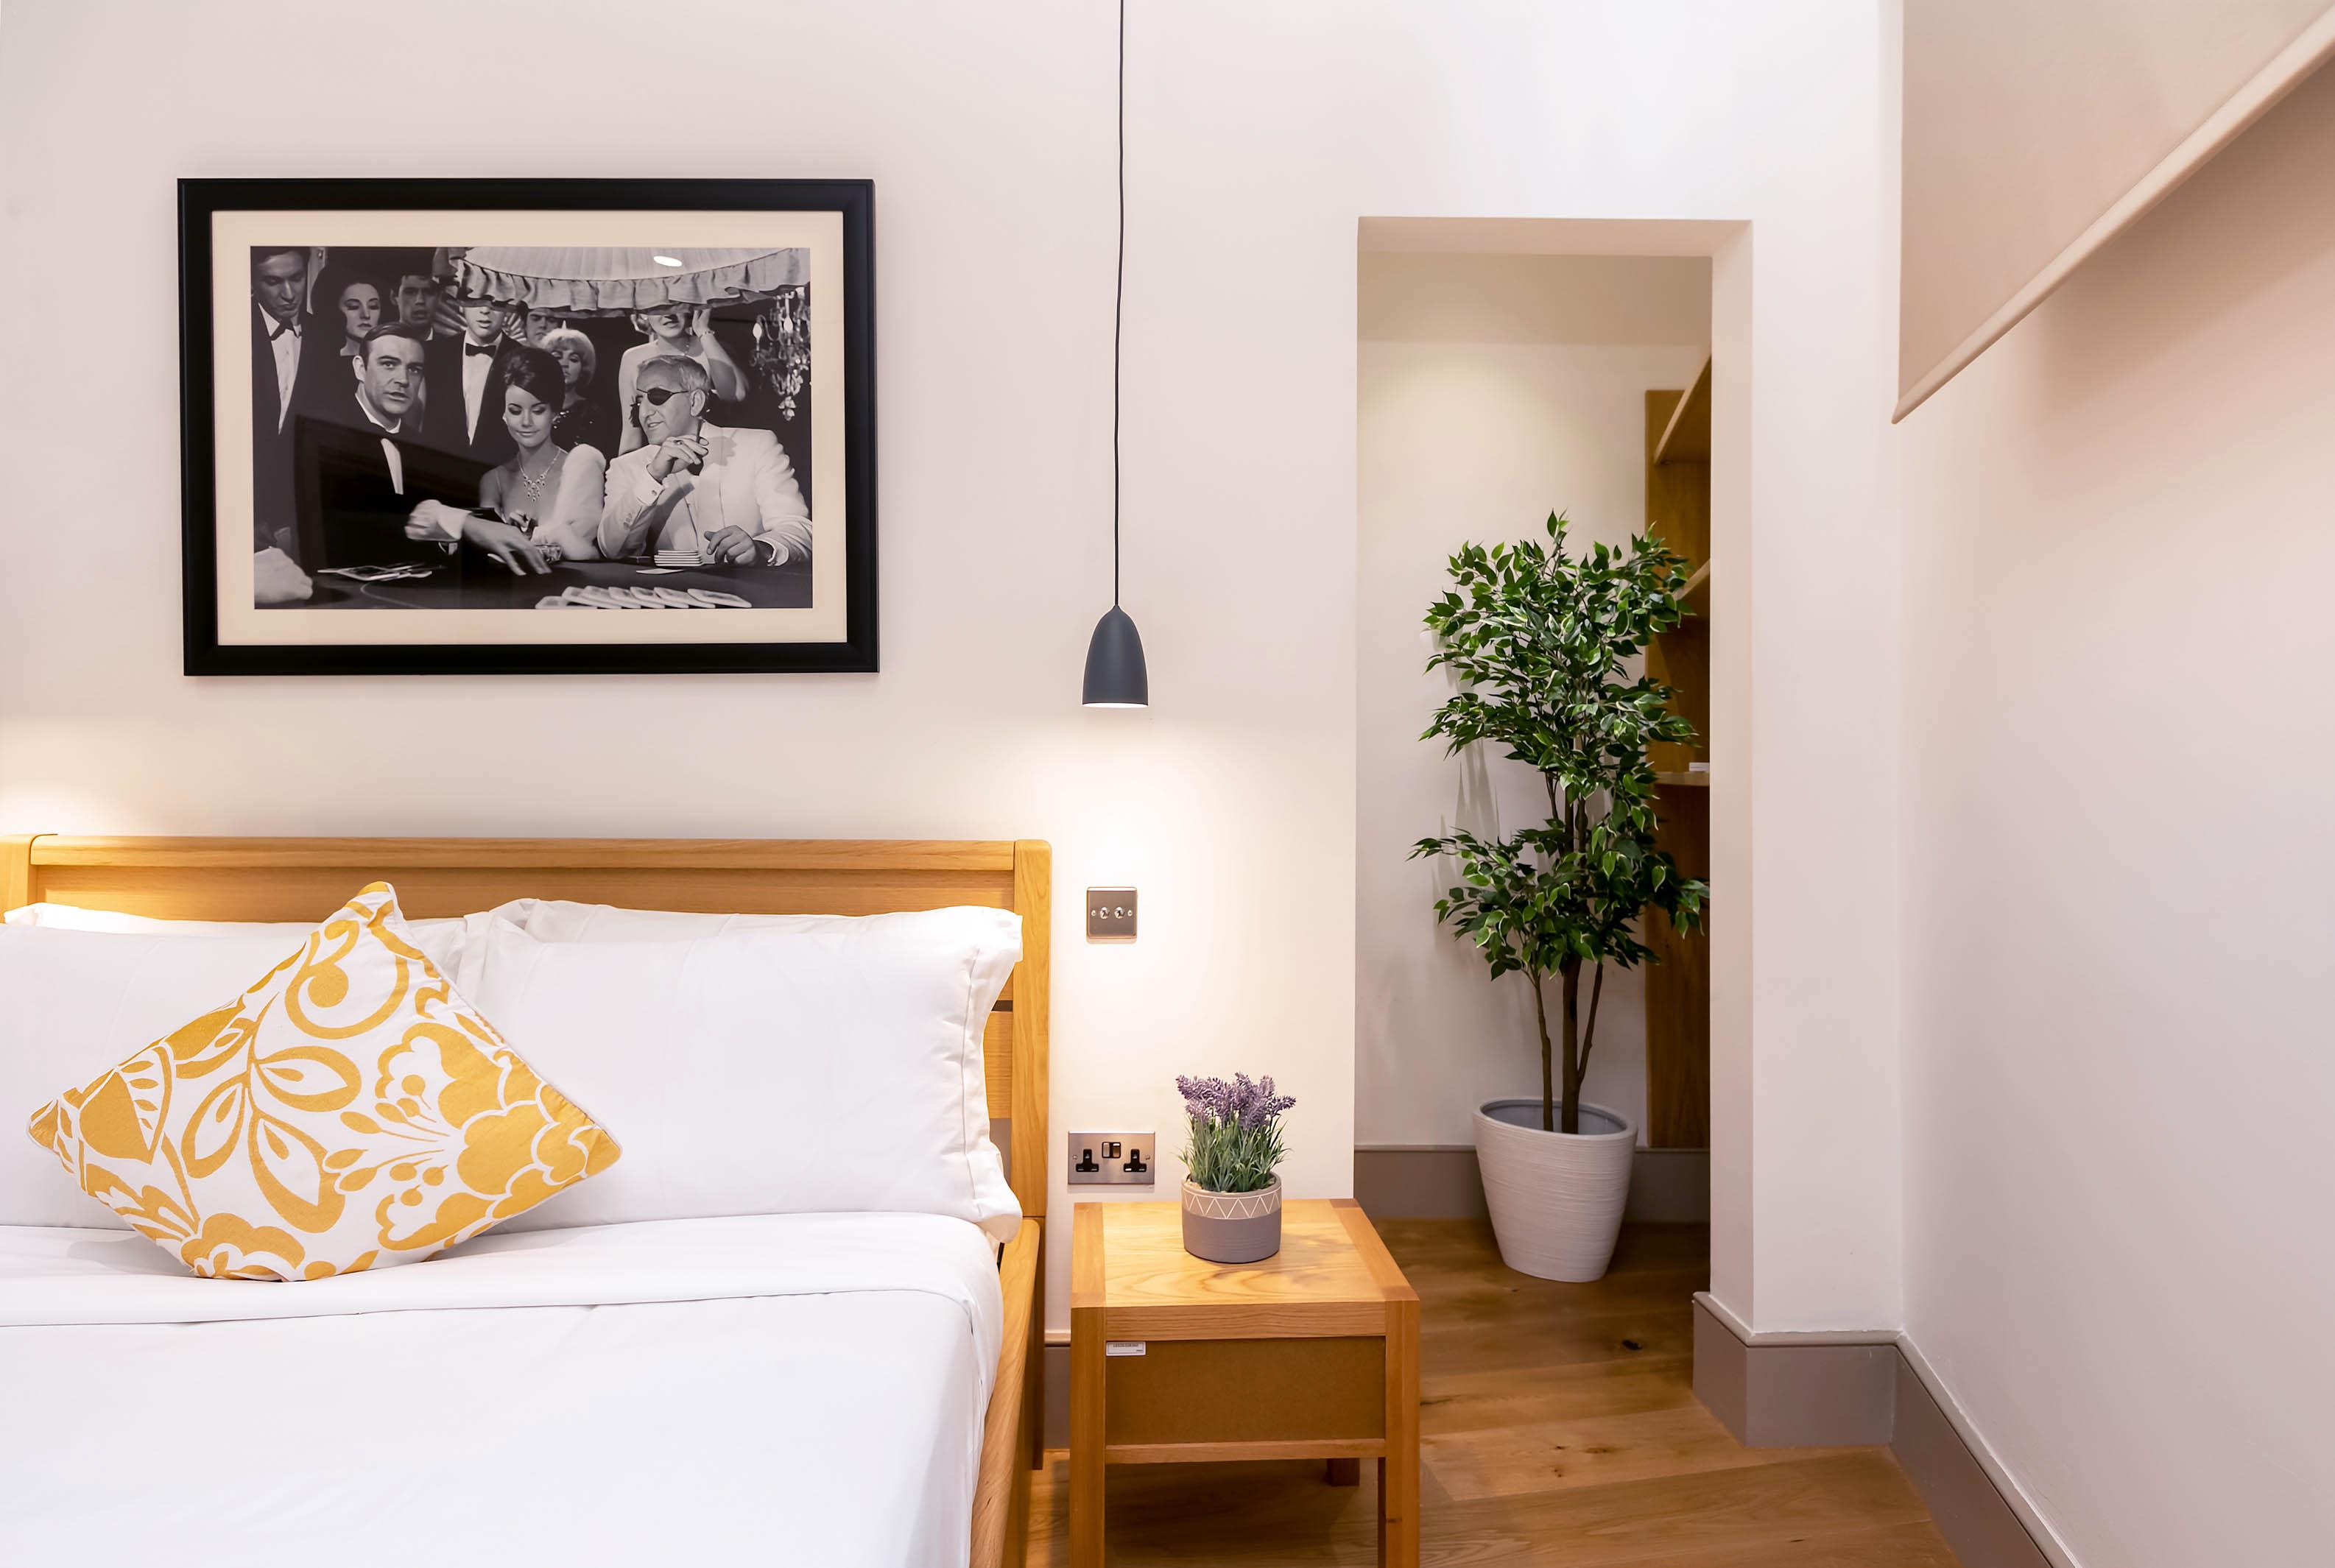 Lovelydays luxury service apartment rental - London - Fitzrovia - Wells Mews B - Lovelysuite - 2 bedrooms - 2 bathrooms - Double bed - 497befe9b0e0 - Lovelydays